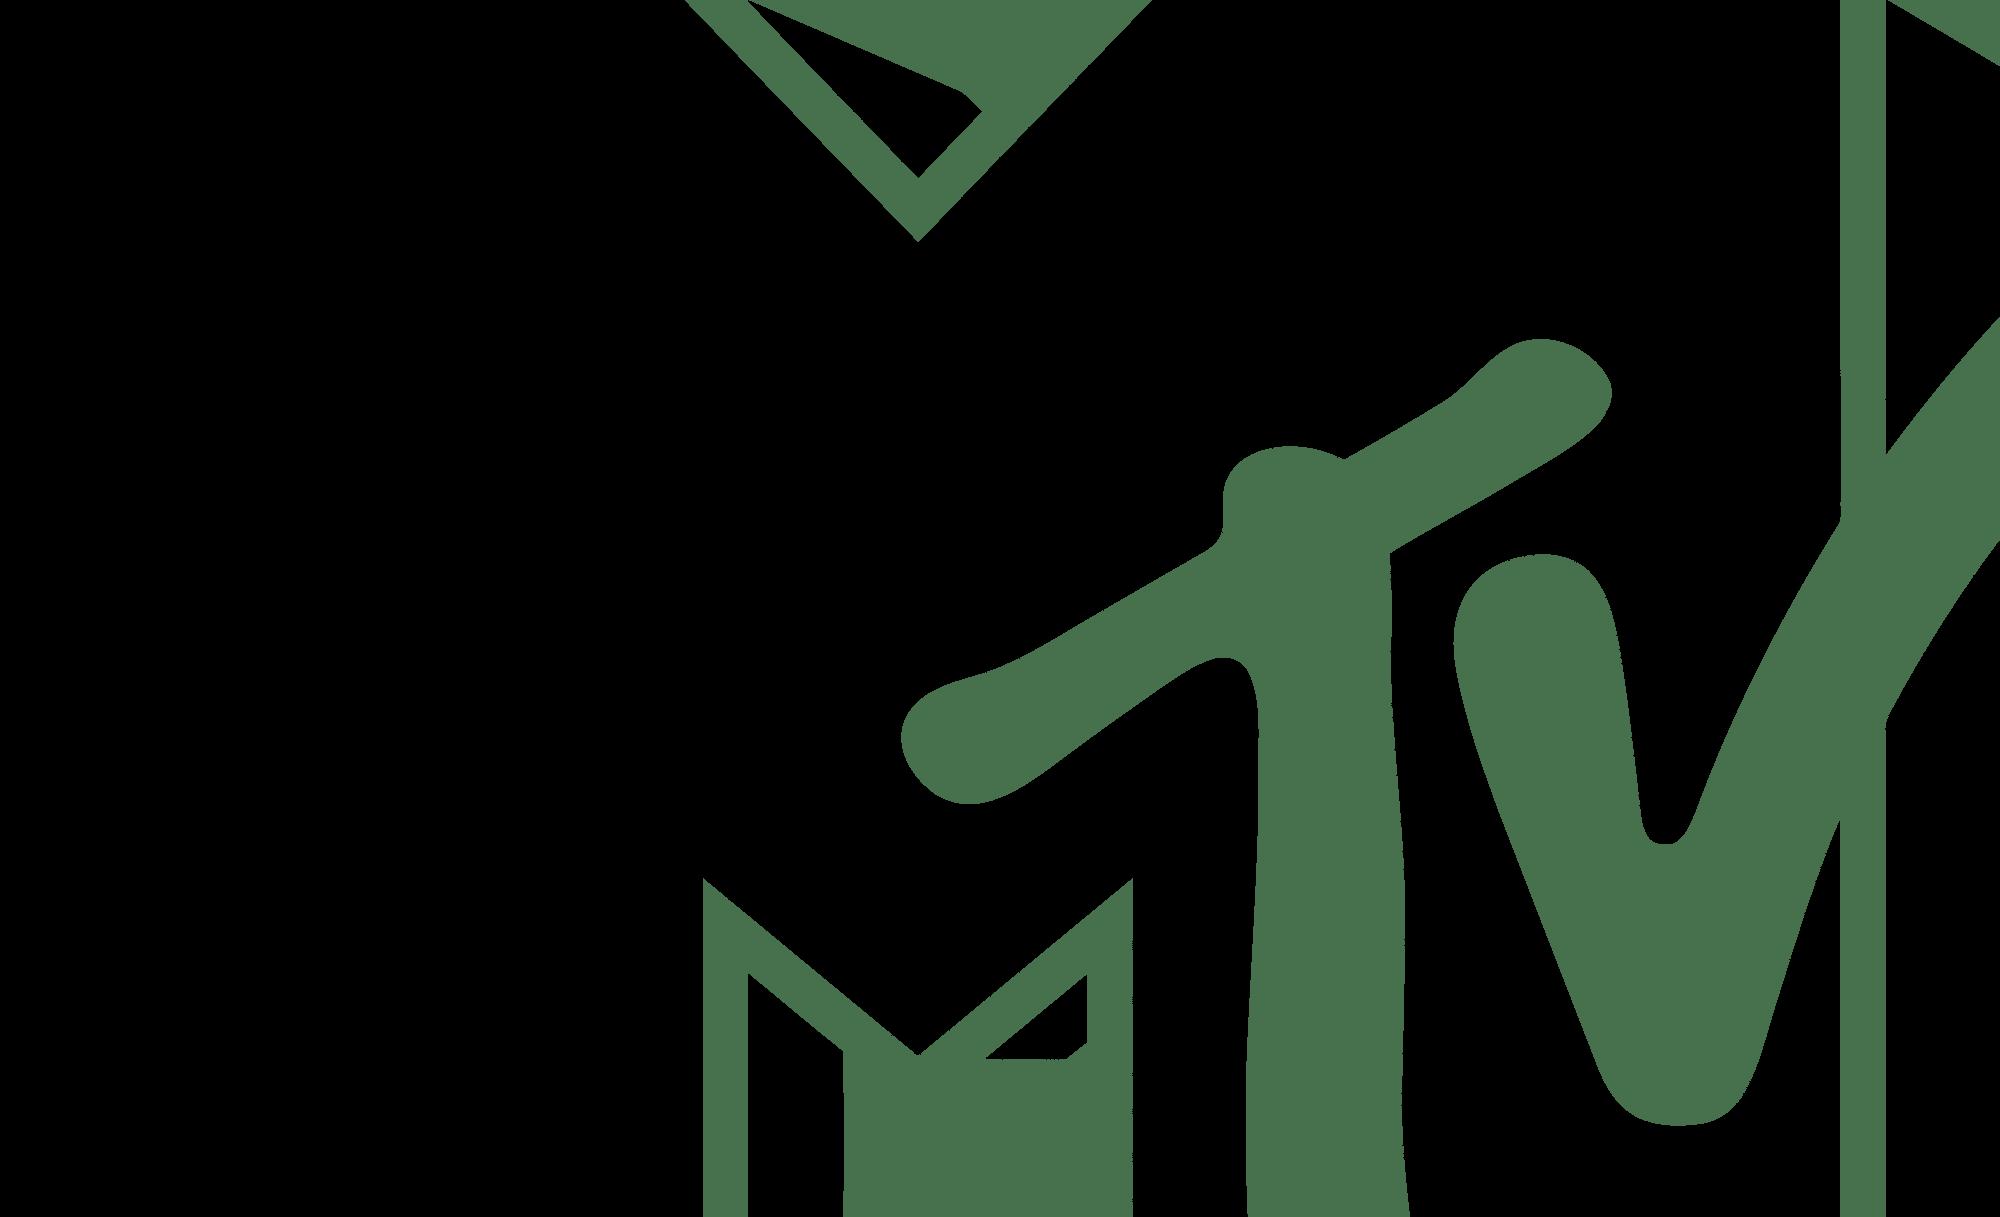 MTV-min.png